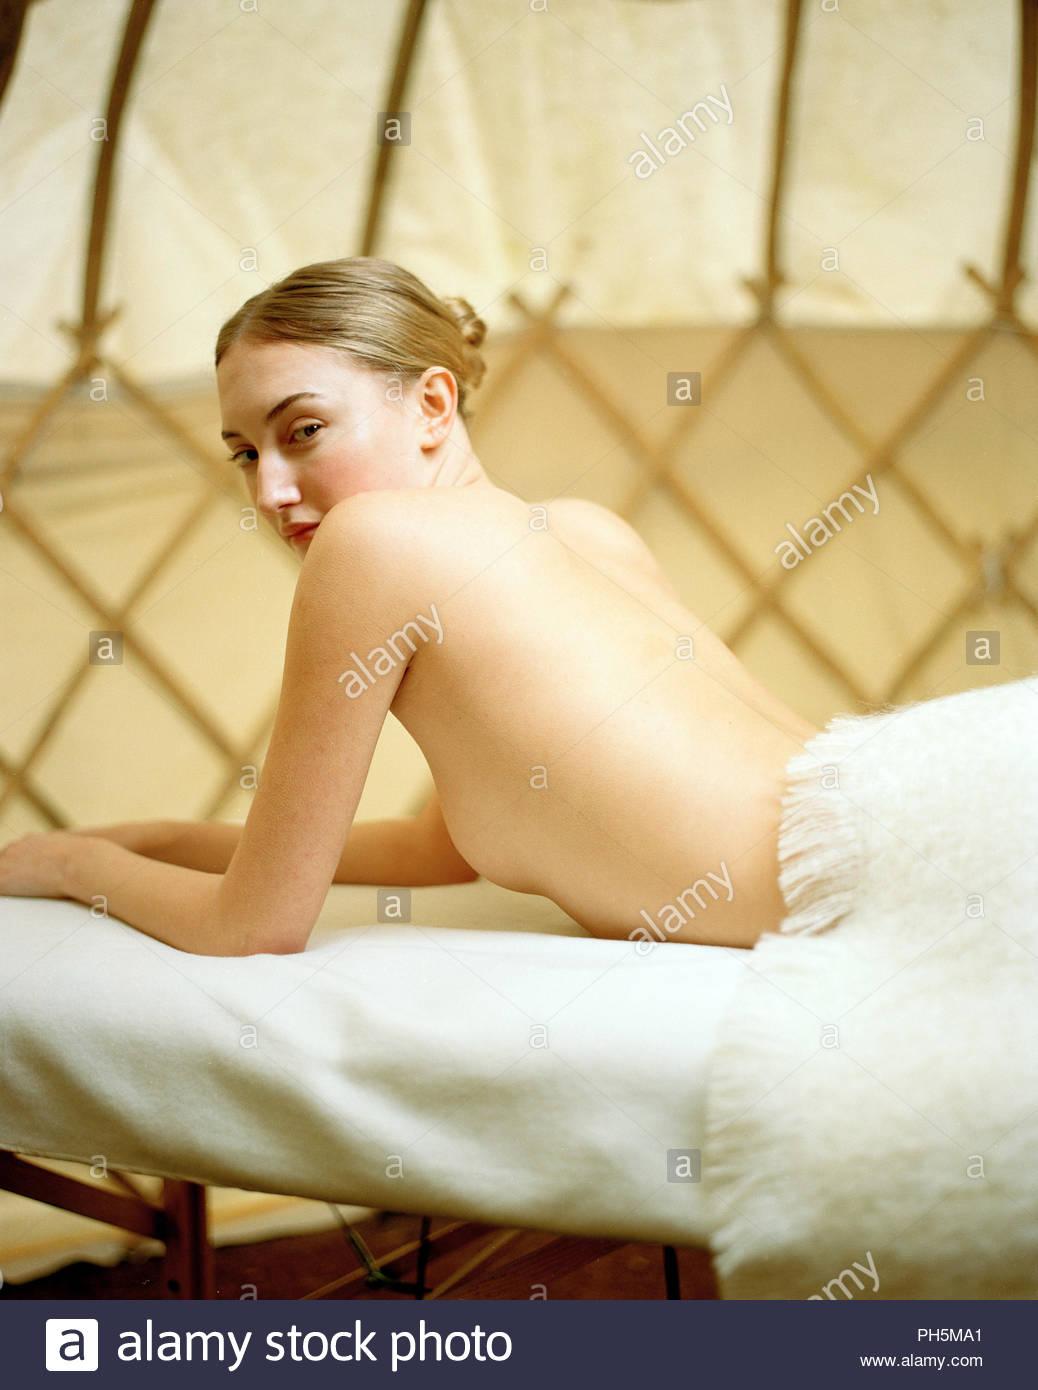 Shirtless young woman lying on massage table - Stock Image